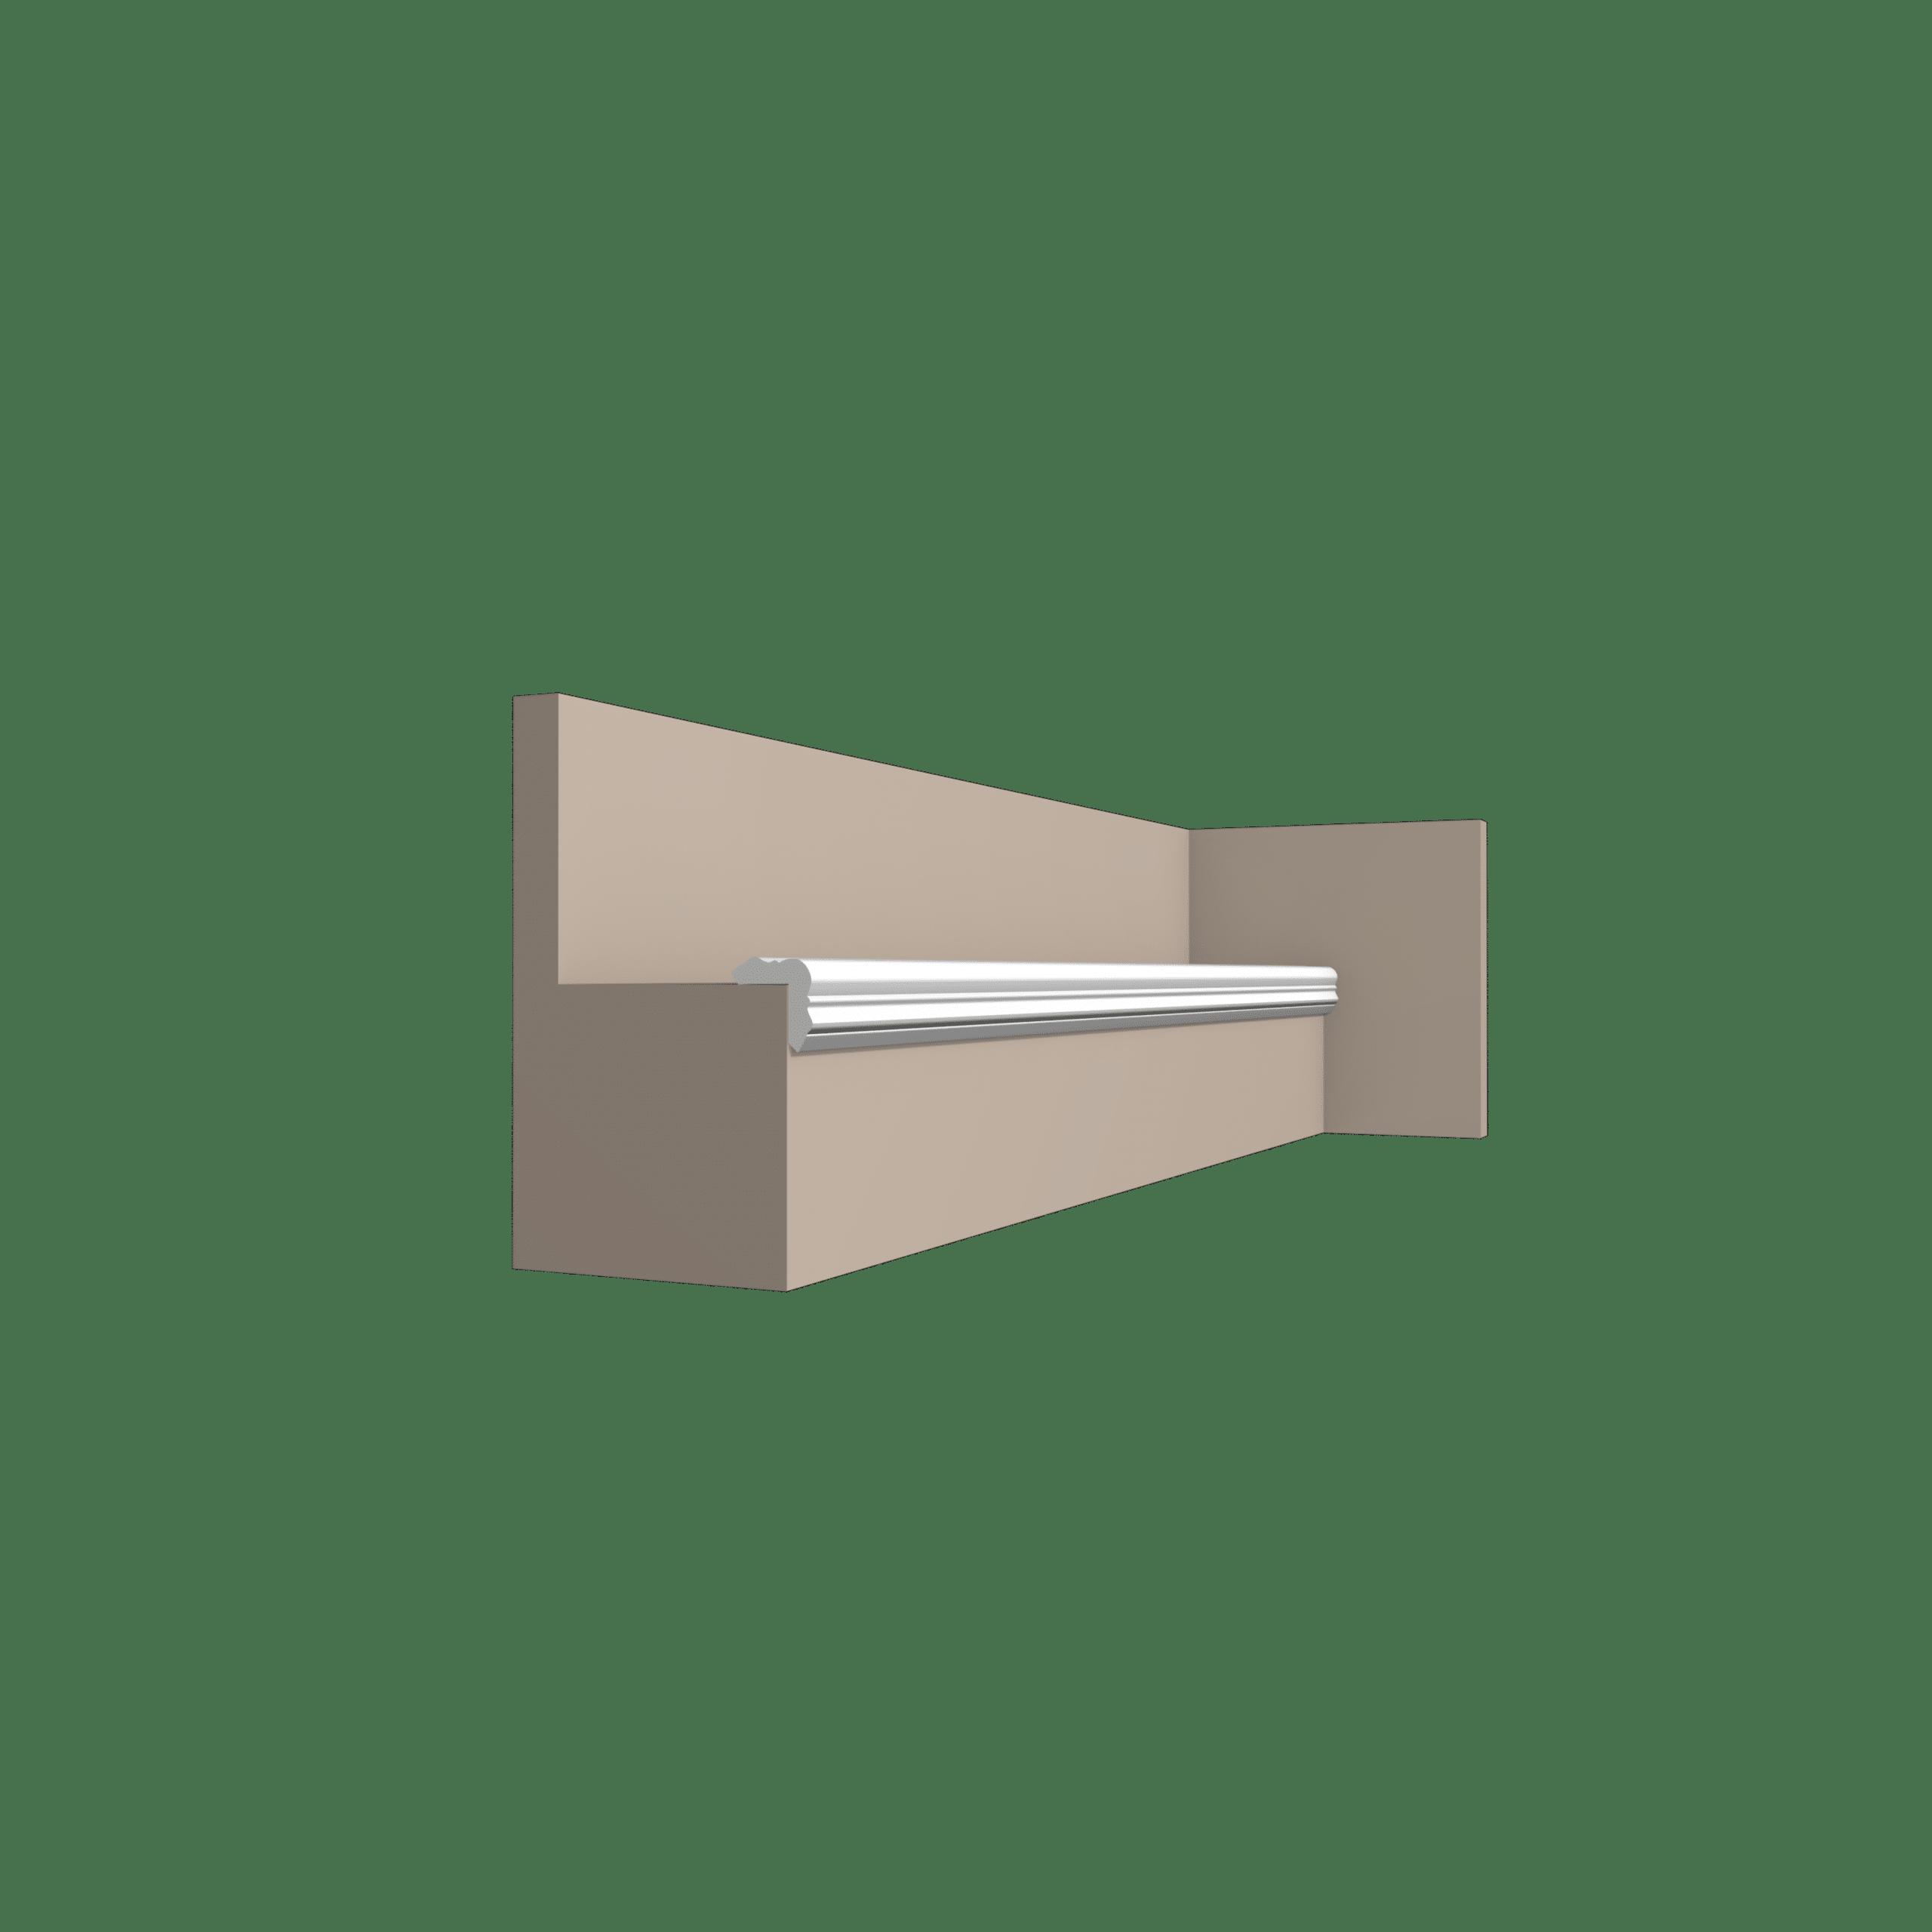 קרניז פוליאוריתן דגם DS - 2525